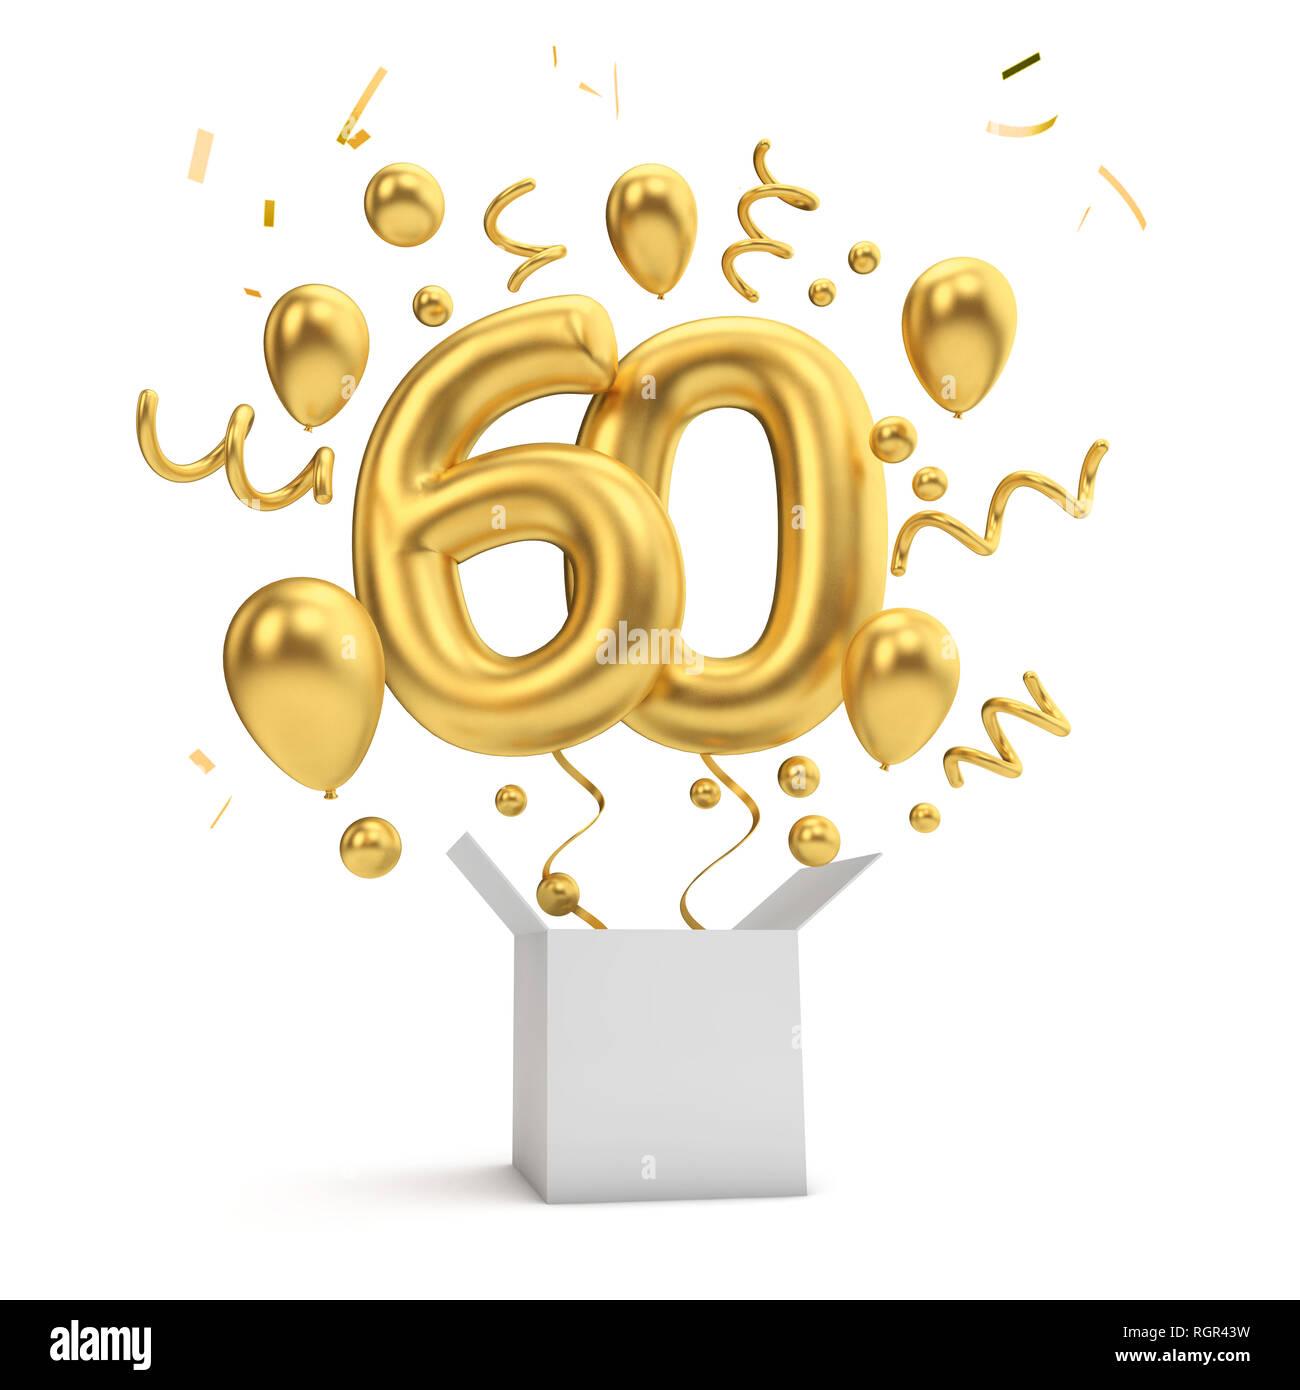 Happy 60th Birthday Gold Uberraschung Ballon Und Box 3d Rendering Stockfotografie Alamy